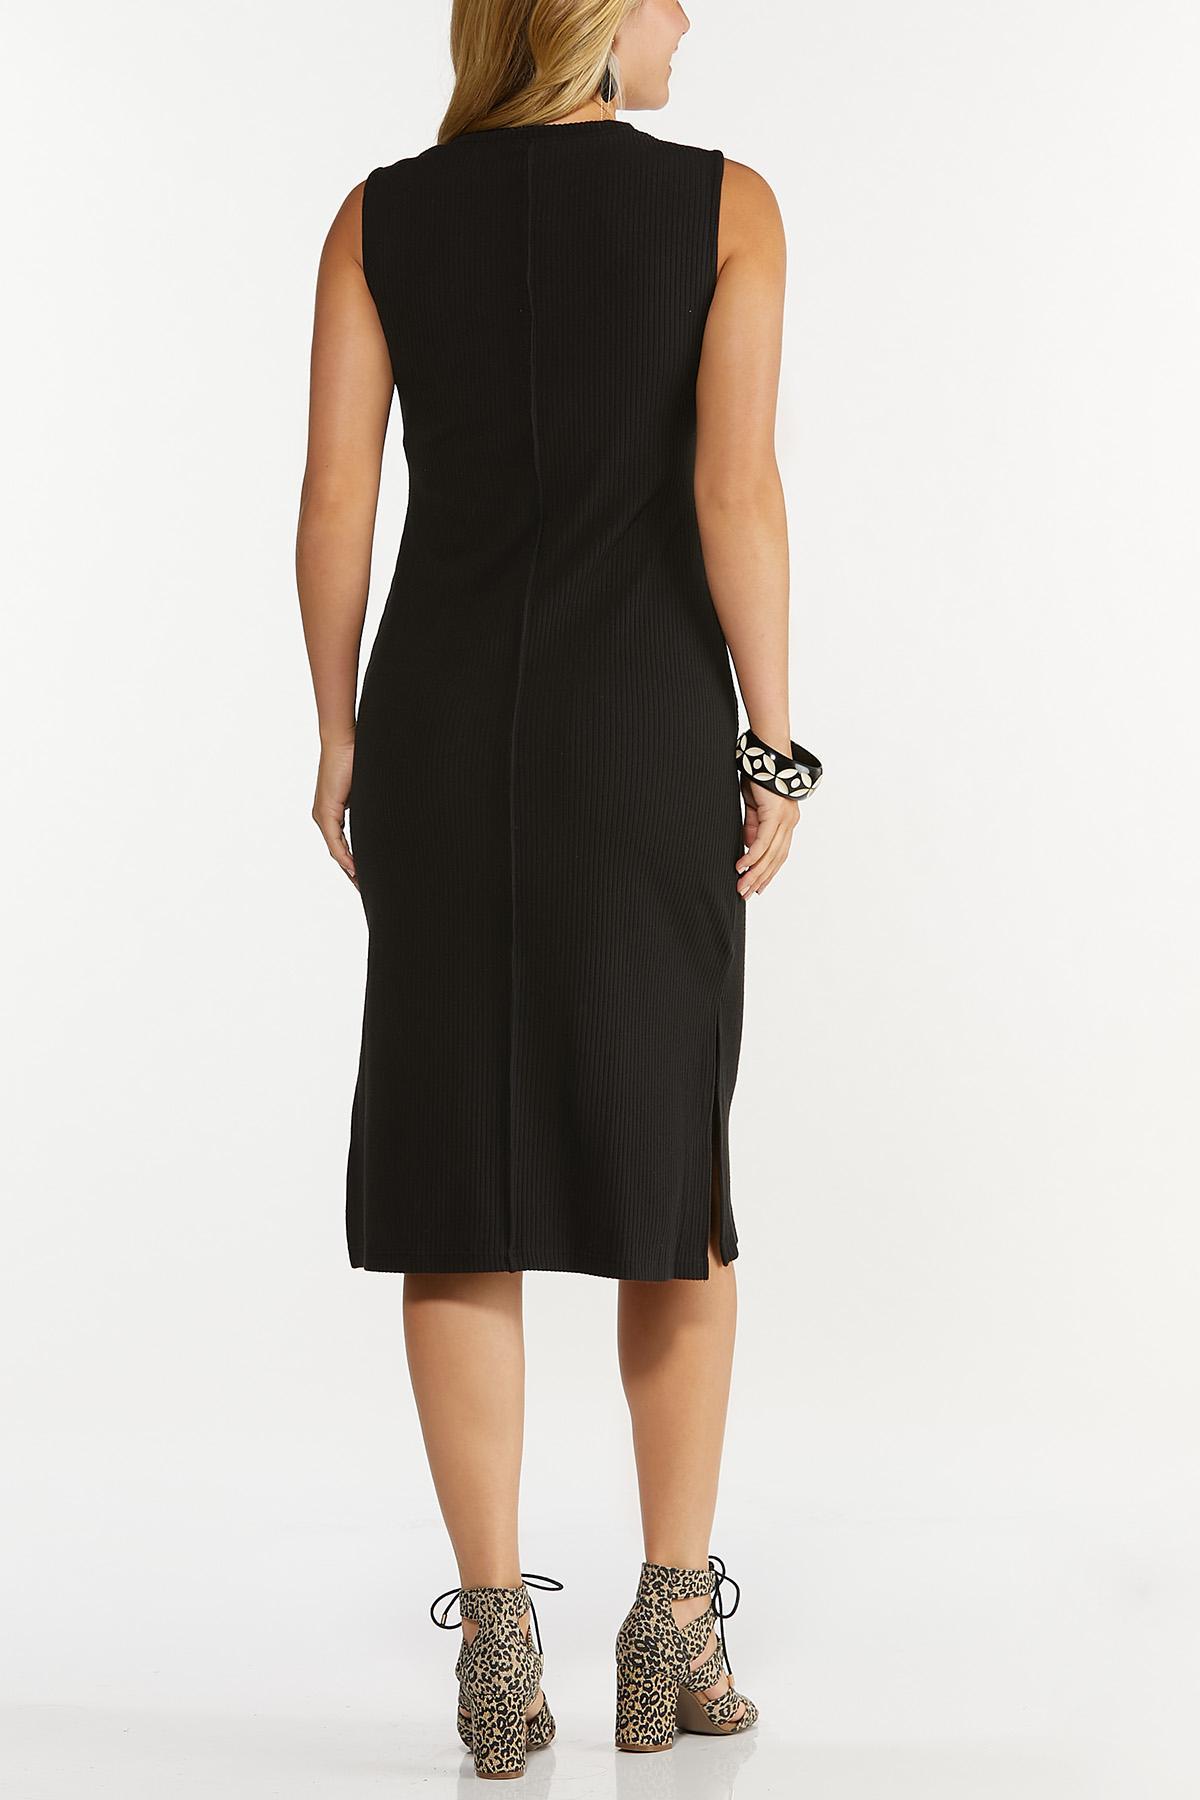 Black Ribbed Midi Dress (Item #44660827)